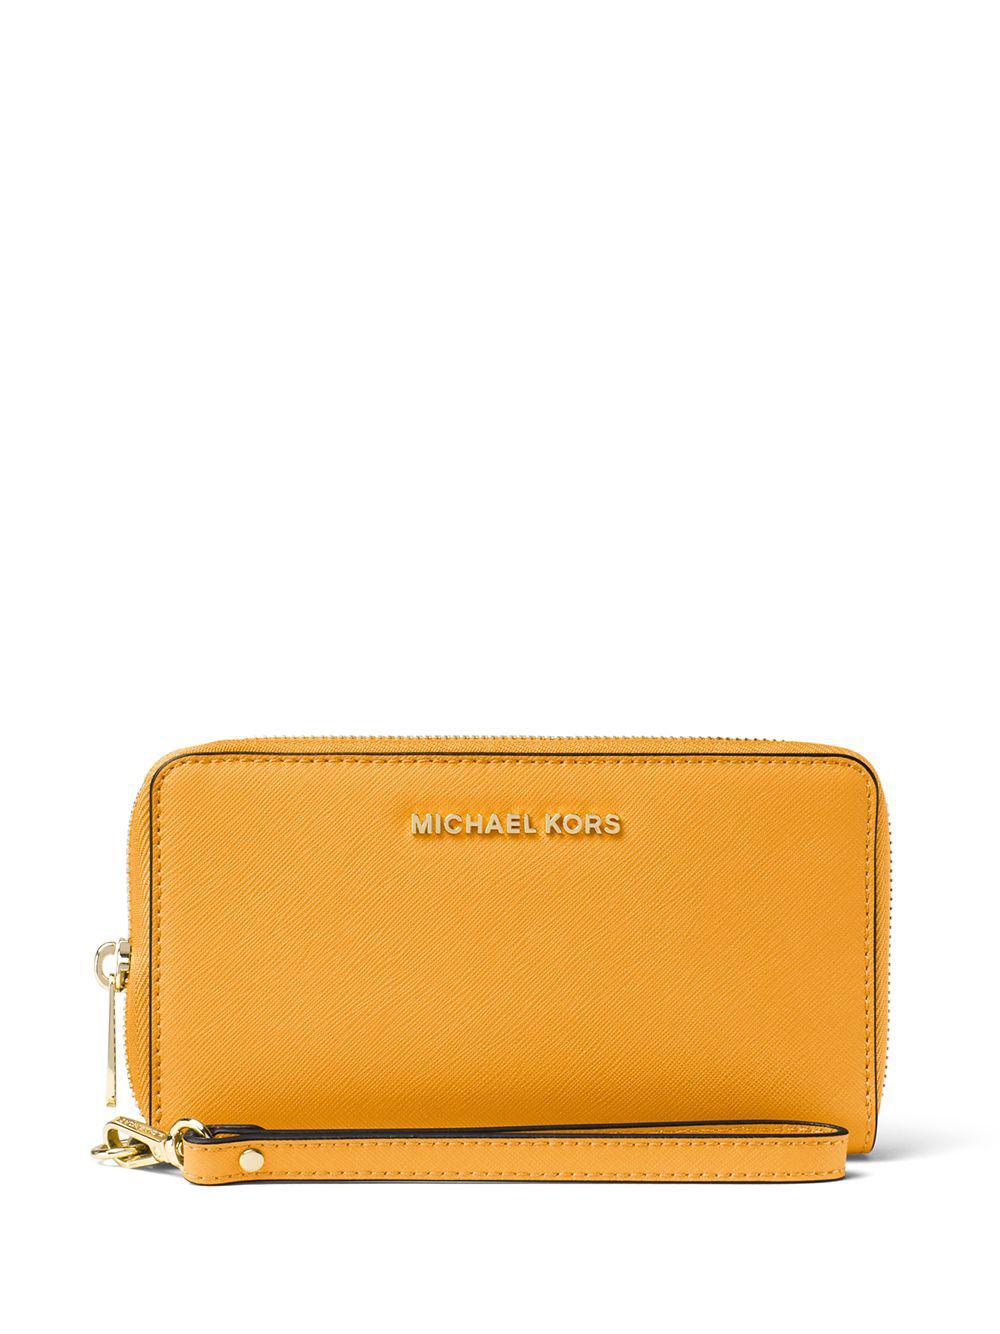 b6e6d1679547 Lyst - Michael Michael Kors Saffiano Leather Zip Wallet in Orange